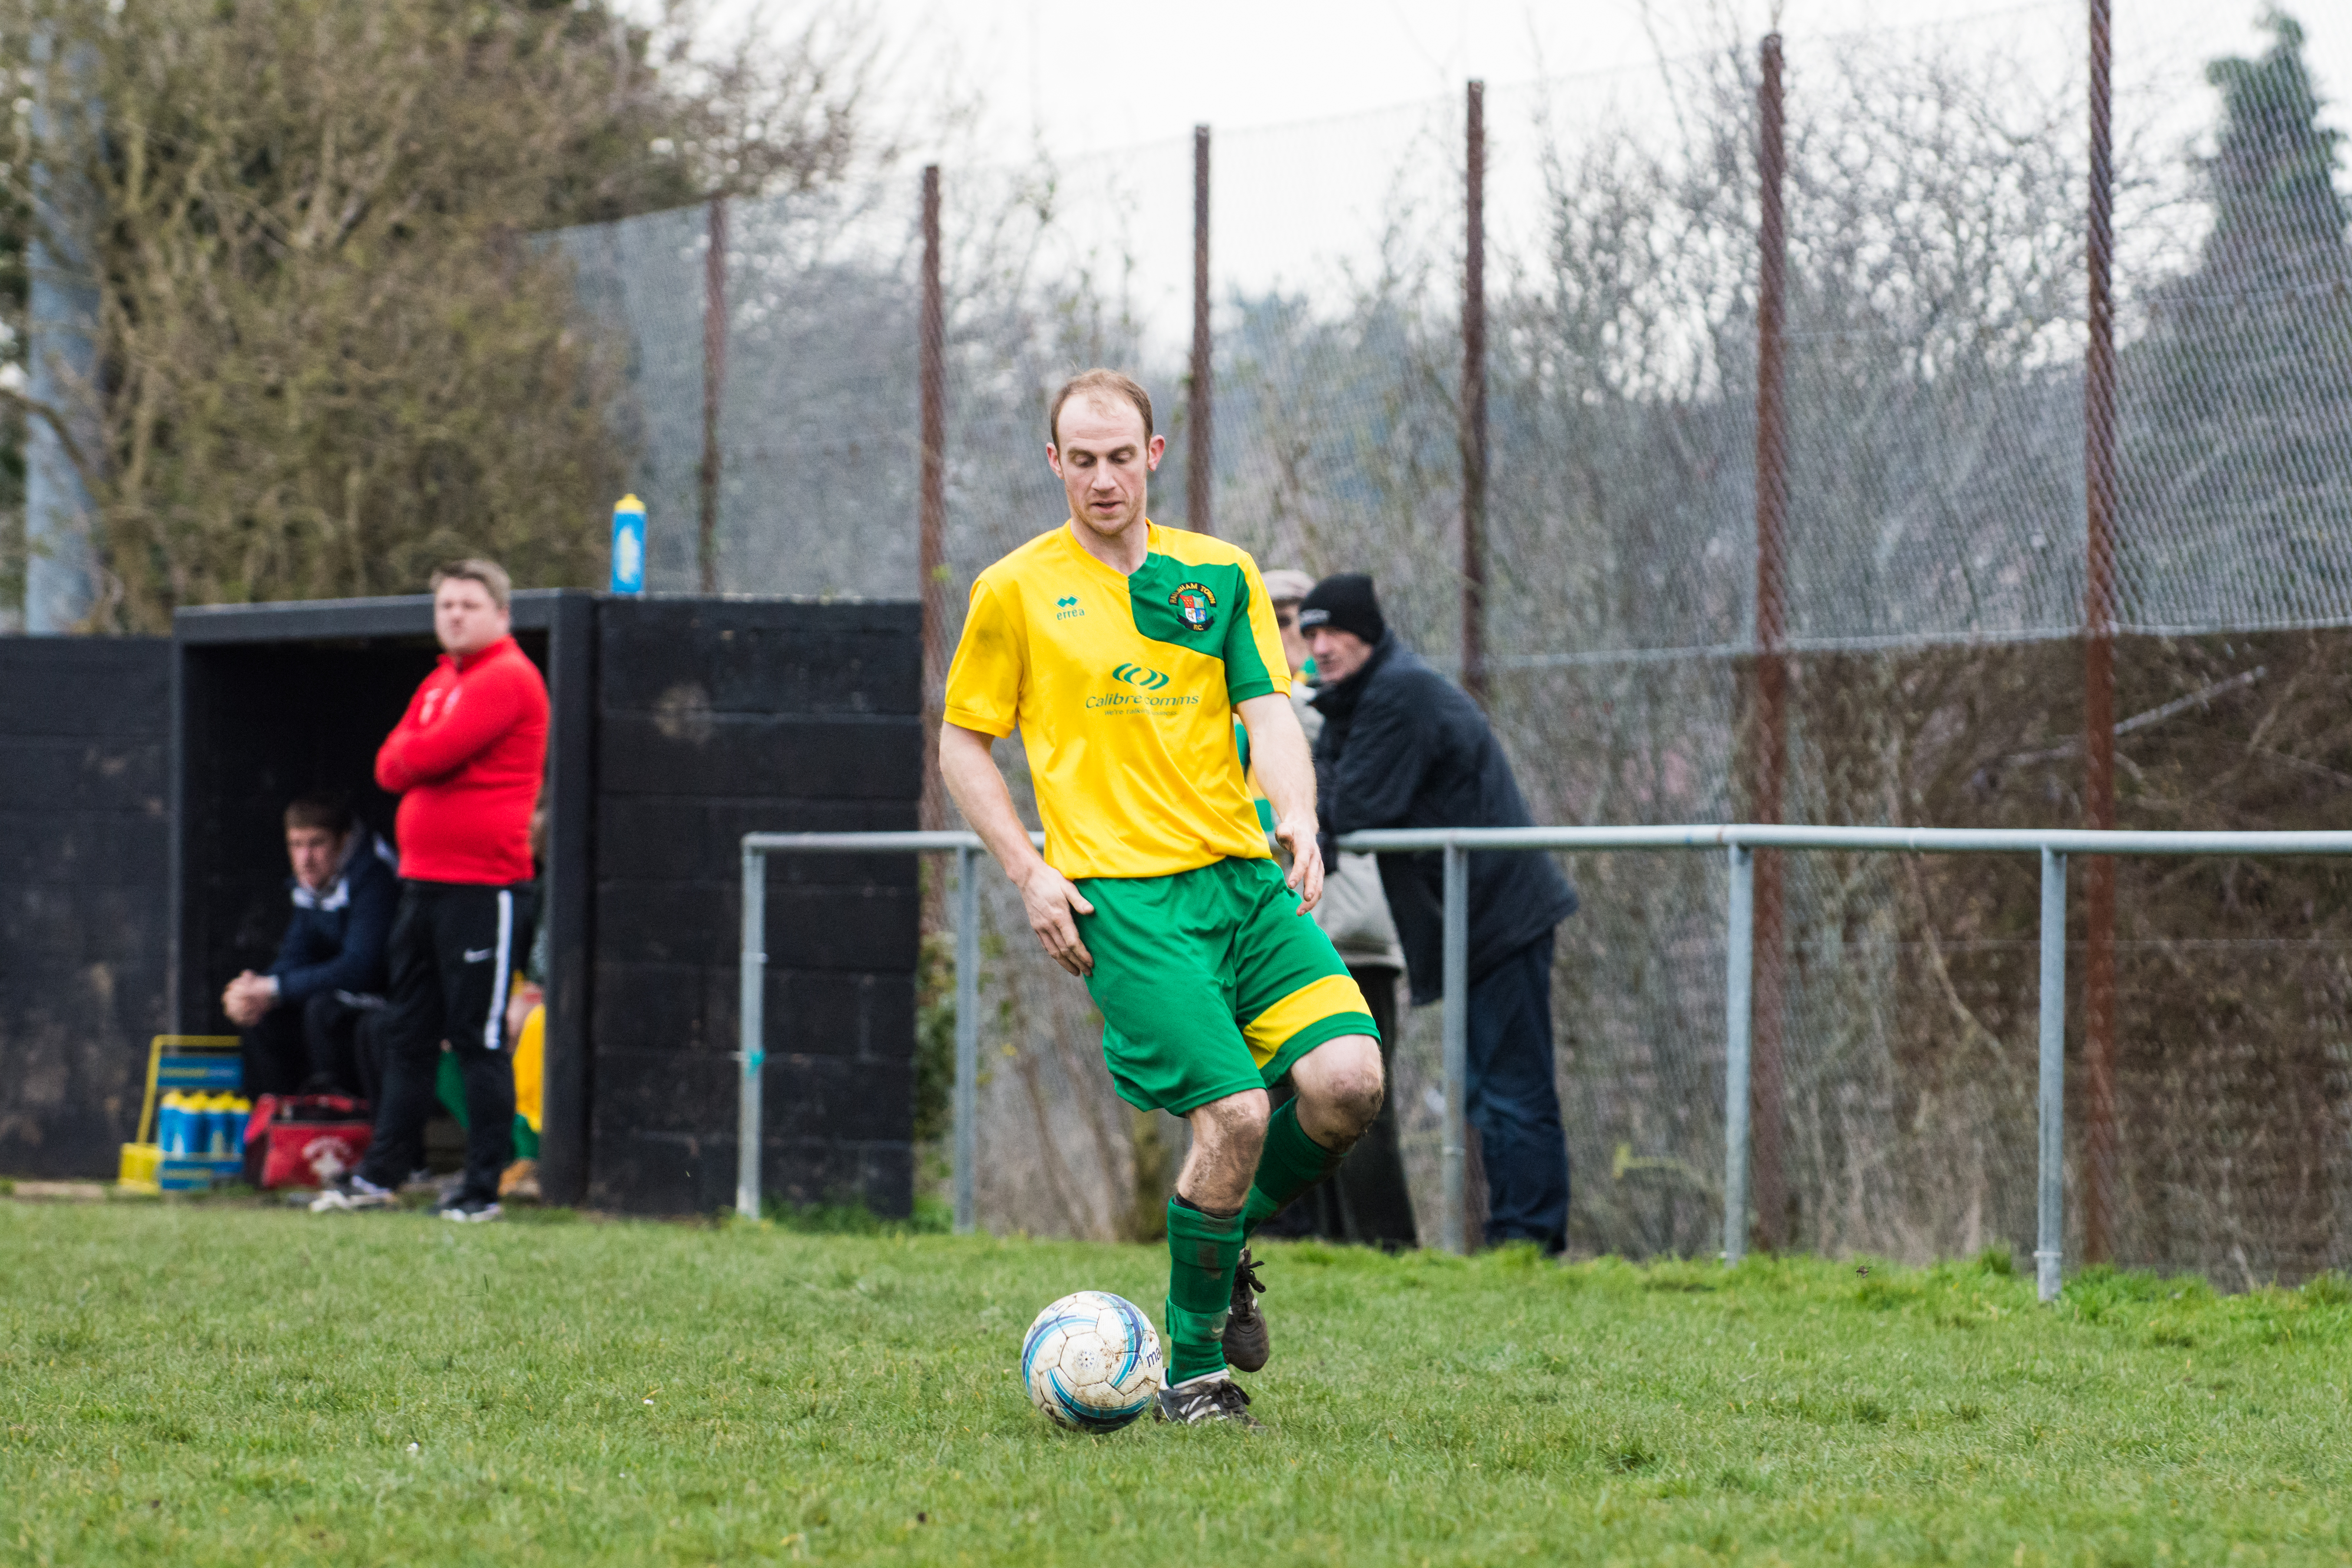 DAVID_JEFFERY Mile Oak FC vs Hailsham Town FC 24.03.18 53